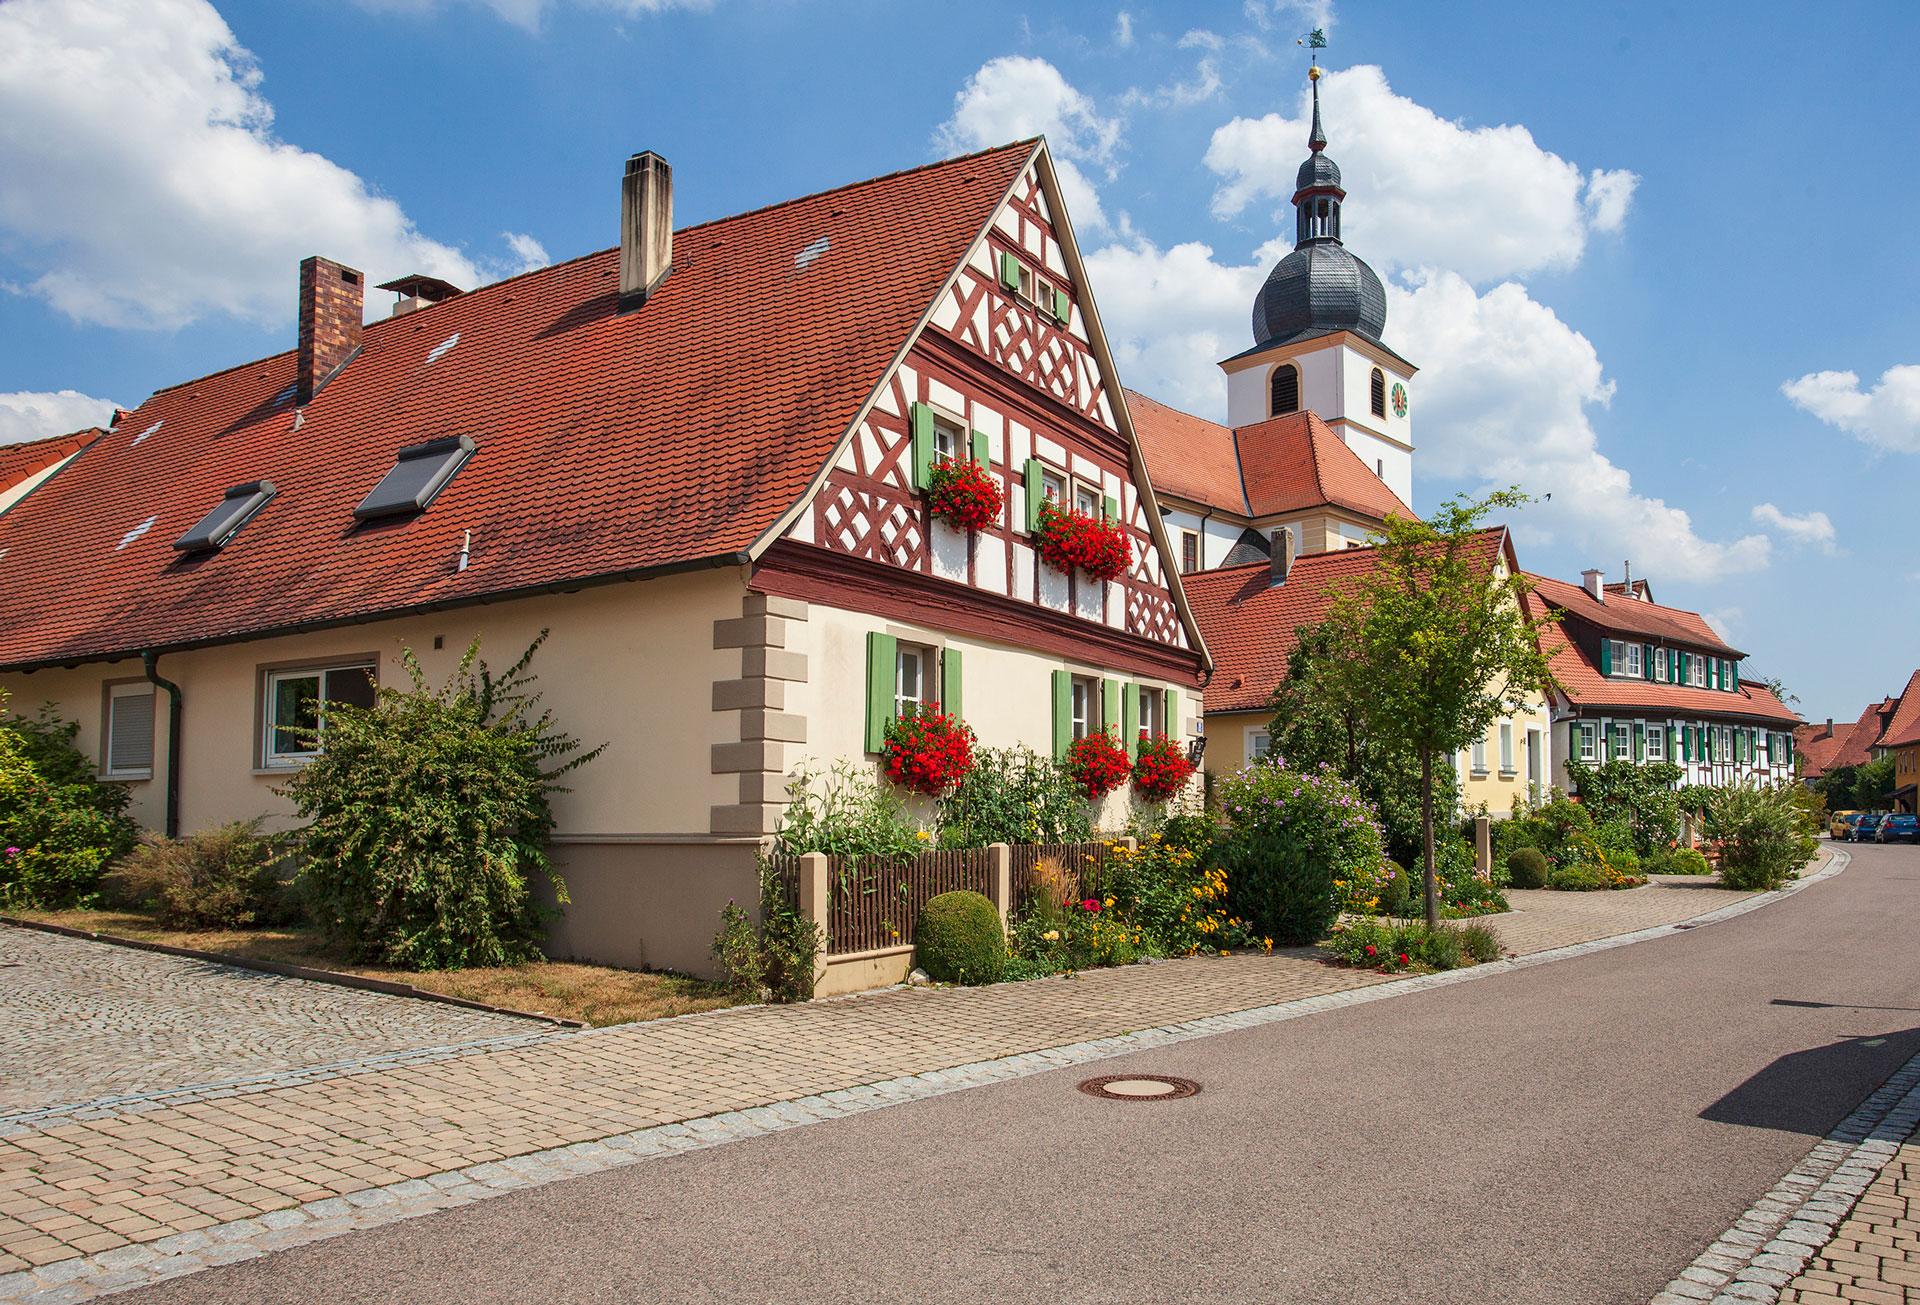 Sugenheim-Malerwinkel